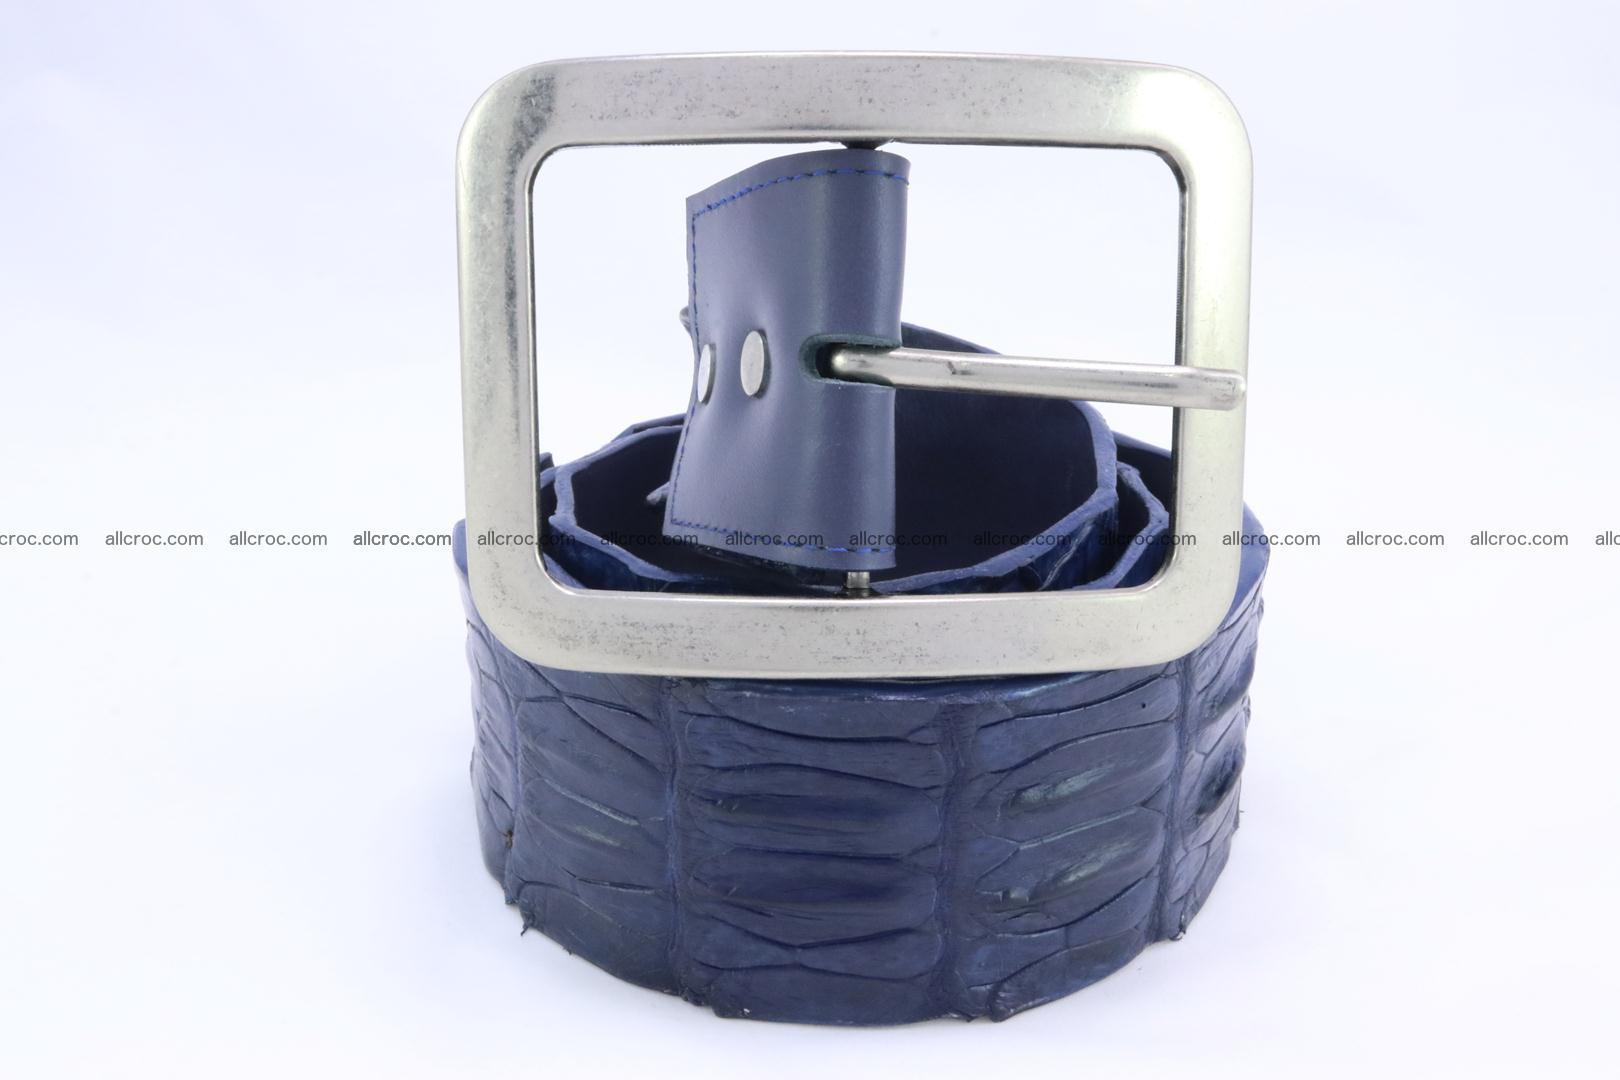 Genuine crocodile hornback belt for jeans width 50mm 154 Foto 1